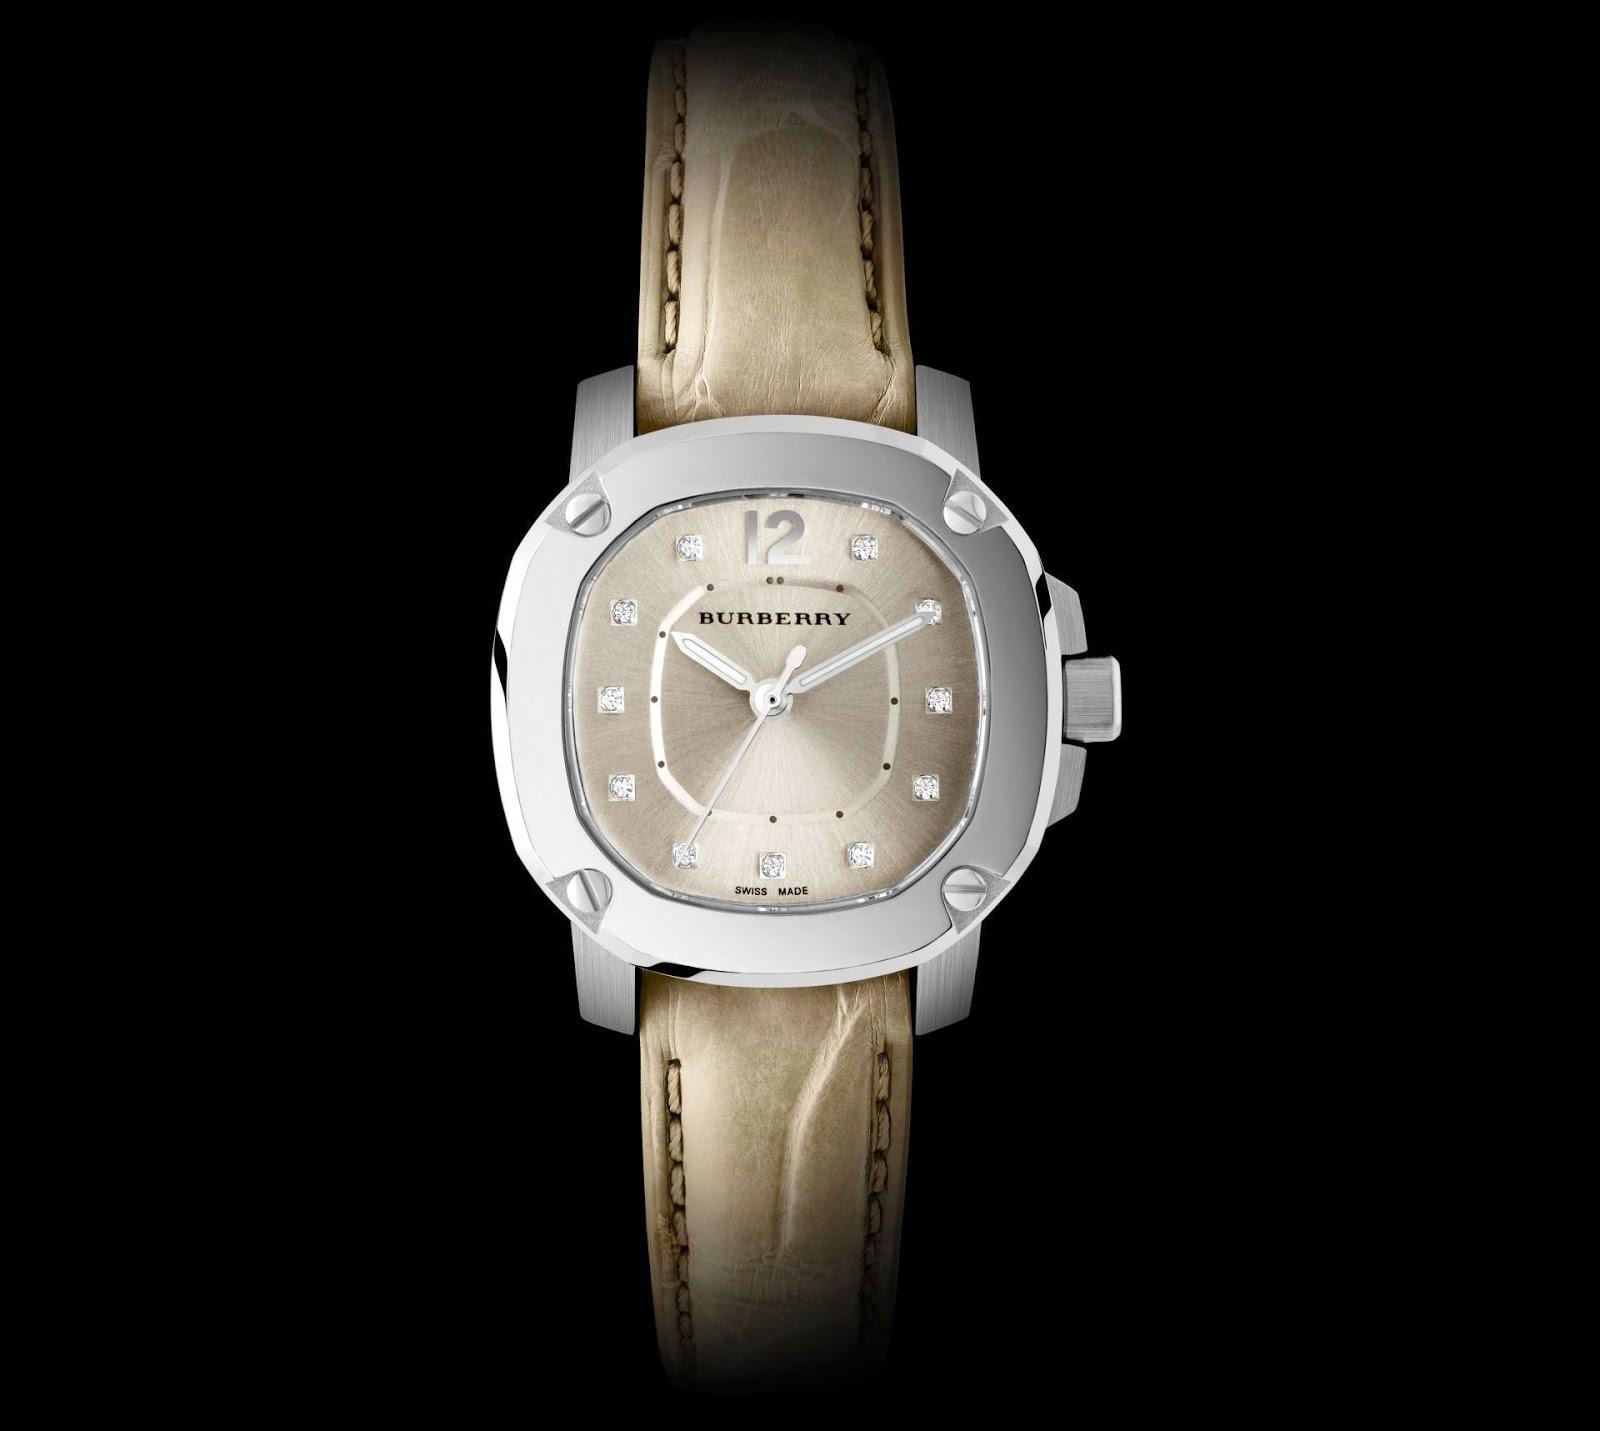 Burberry THE BRITAIN - 26MM QUARTZ watch (BBY1950, 26MM)